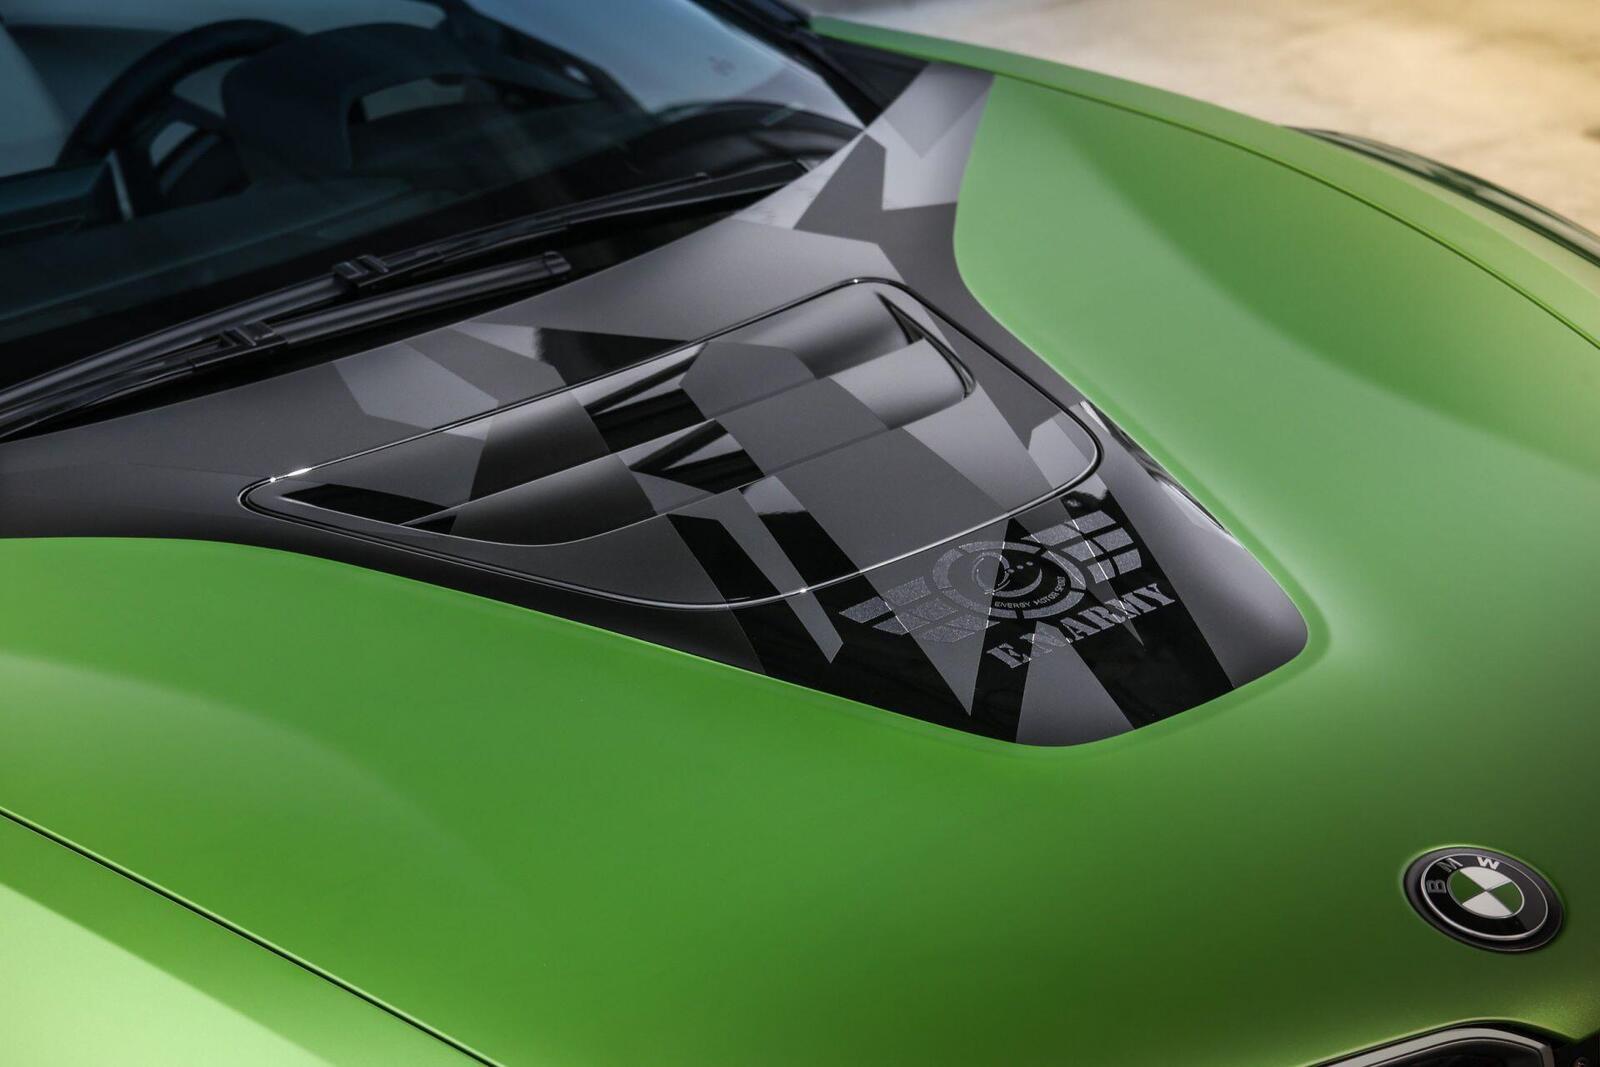 ngam-bmw-i8-roadster-do-cuc-chat-lay-y-tuong-tu-xe-quan-su-6.jpg